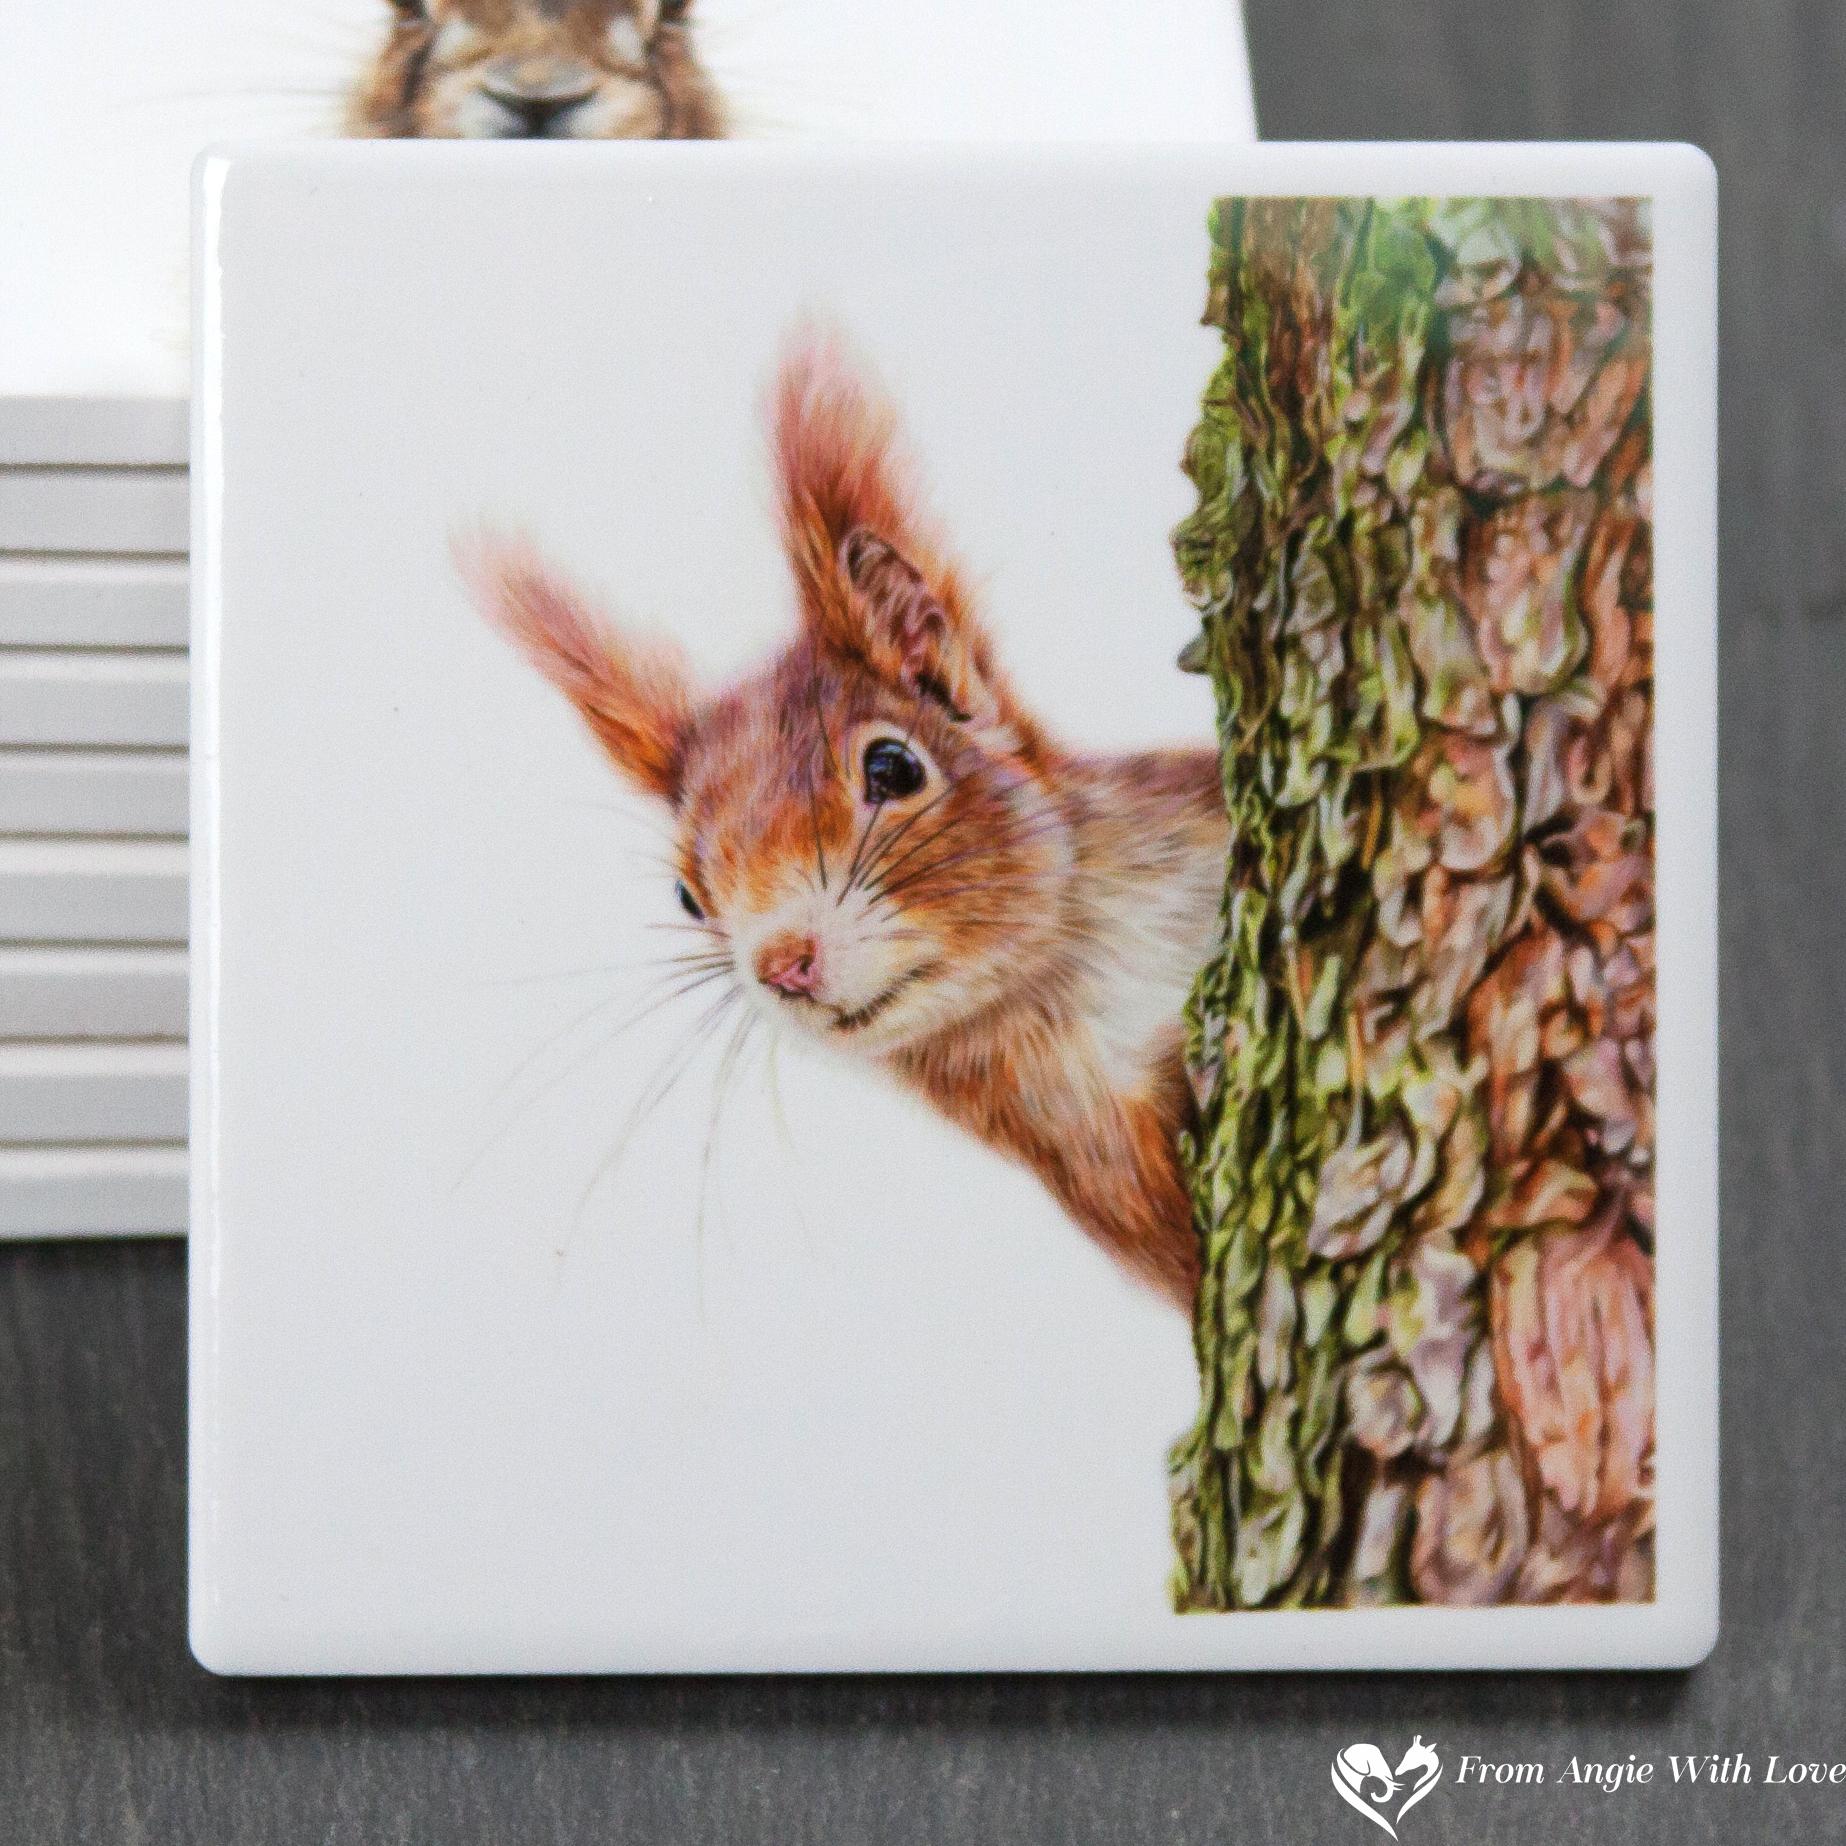 Red Squirrel Coaster - Red Alert